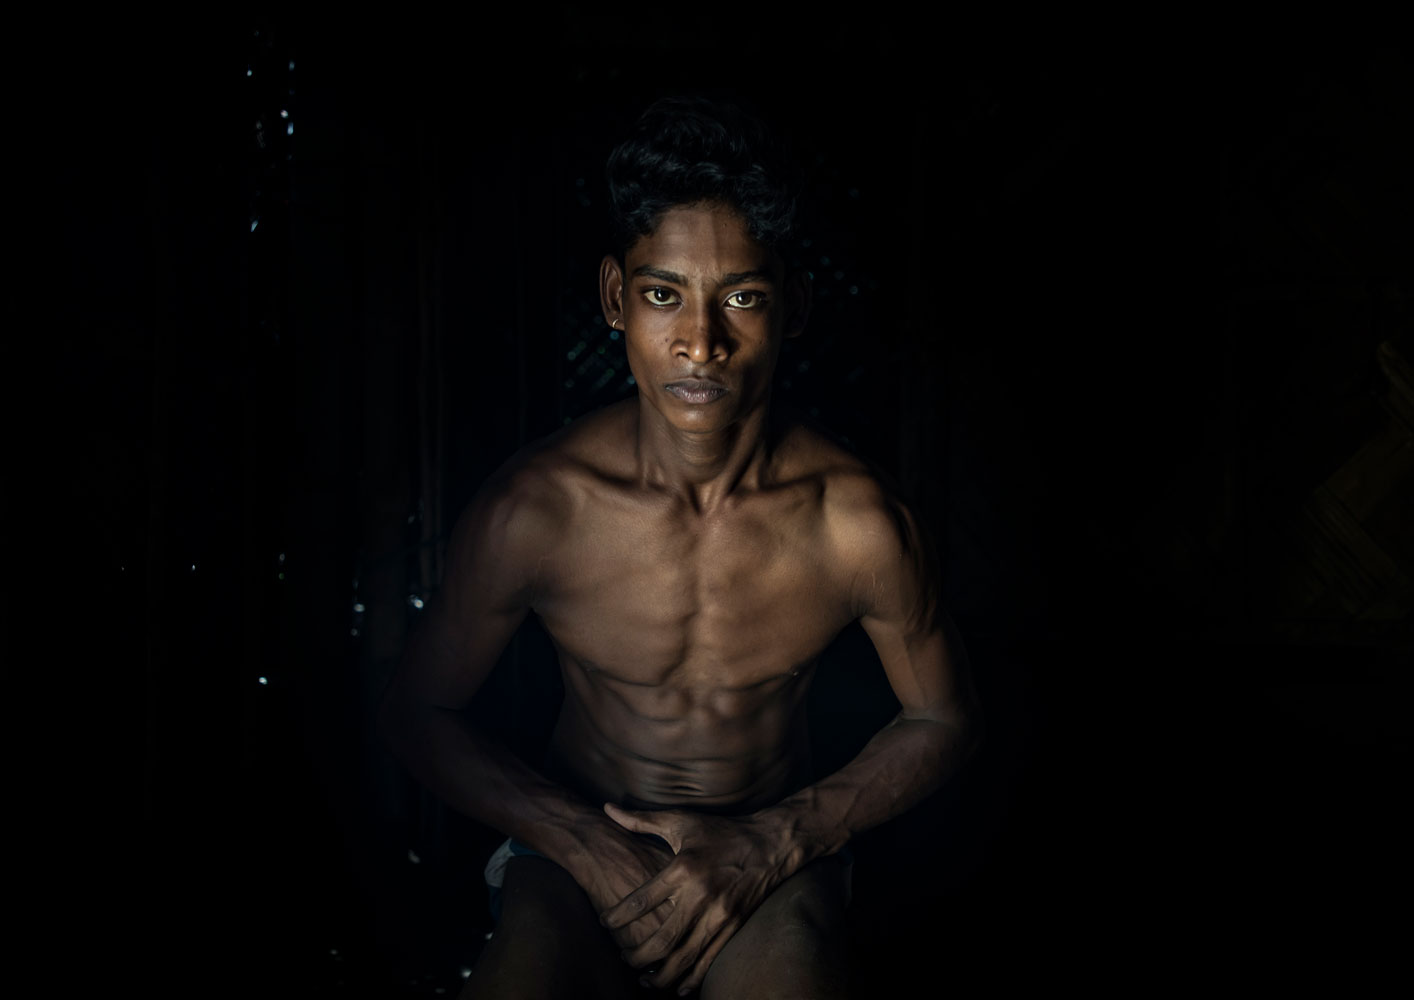 Anjan Ghosh - friendmade.fm - indian photographer urban villages